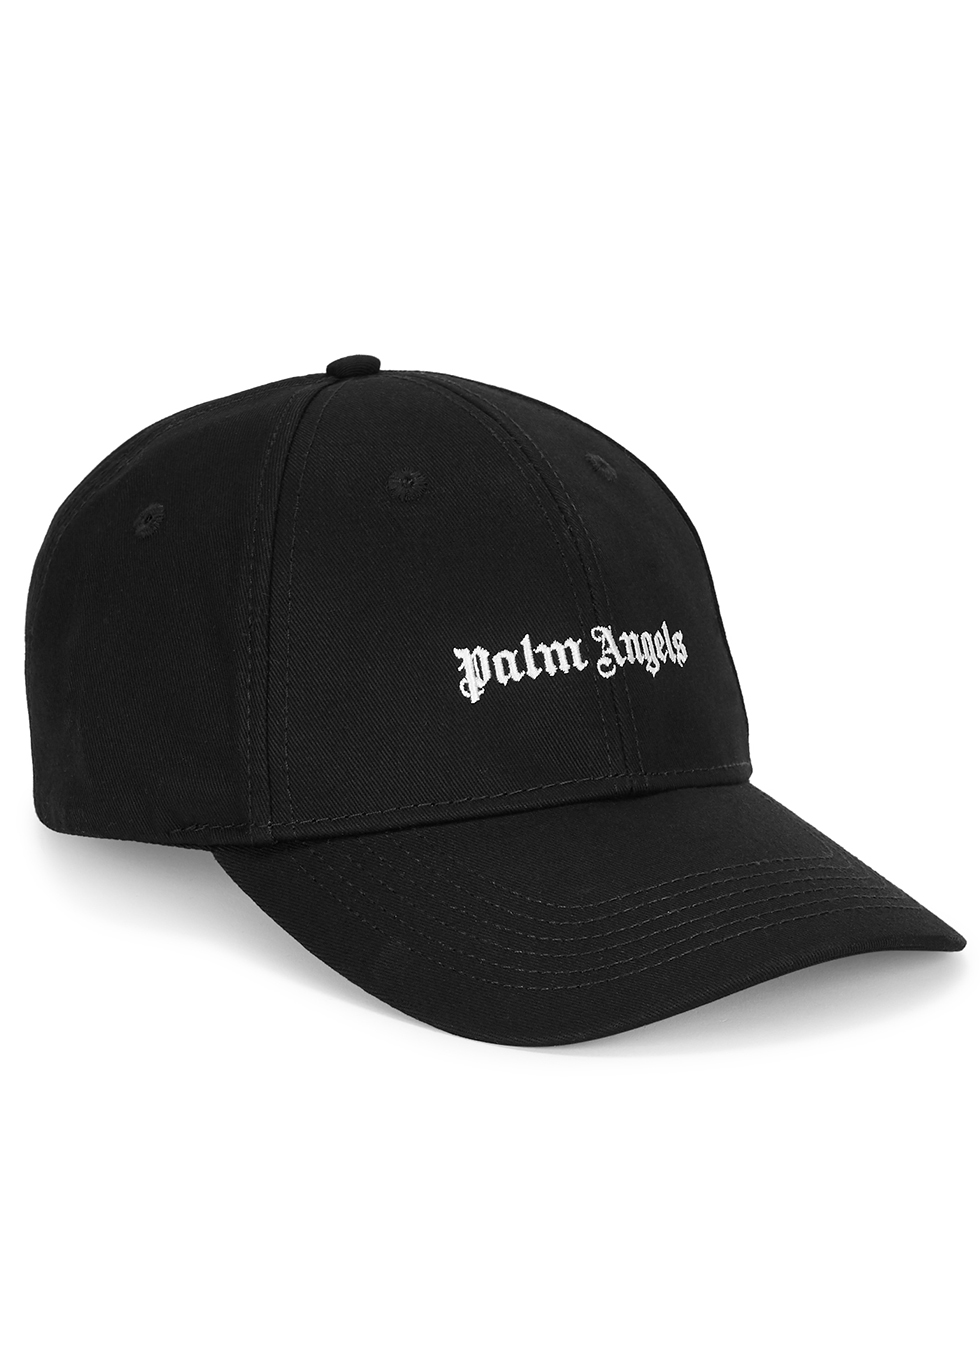 Classic black logo twill cap